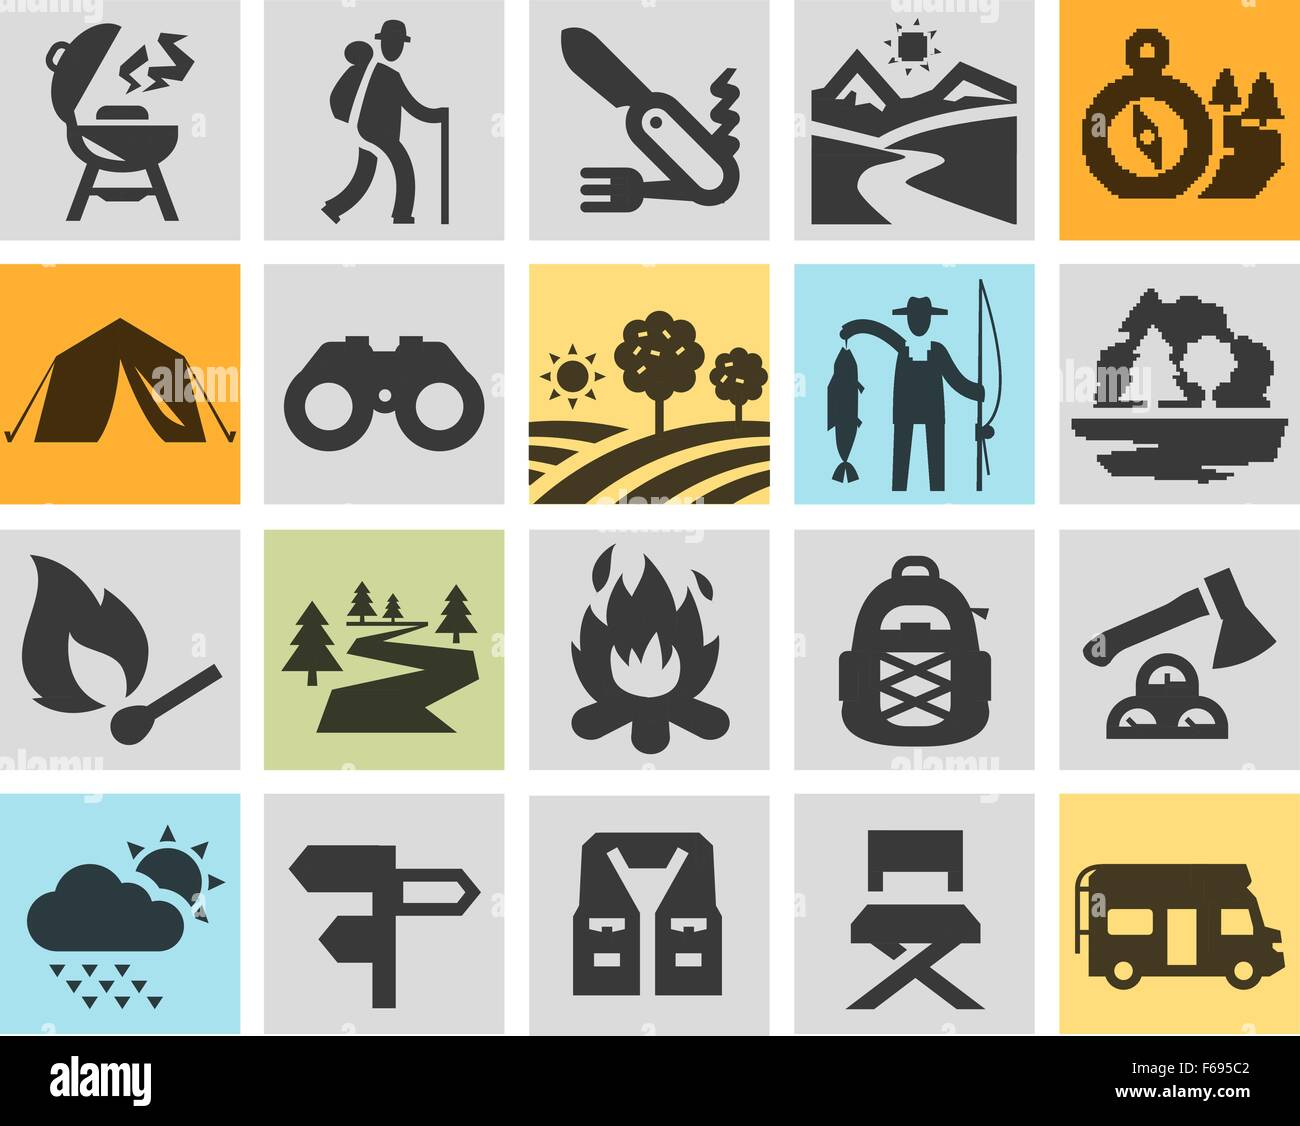 hiking black icons set trip walking tour or expedition